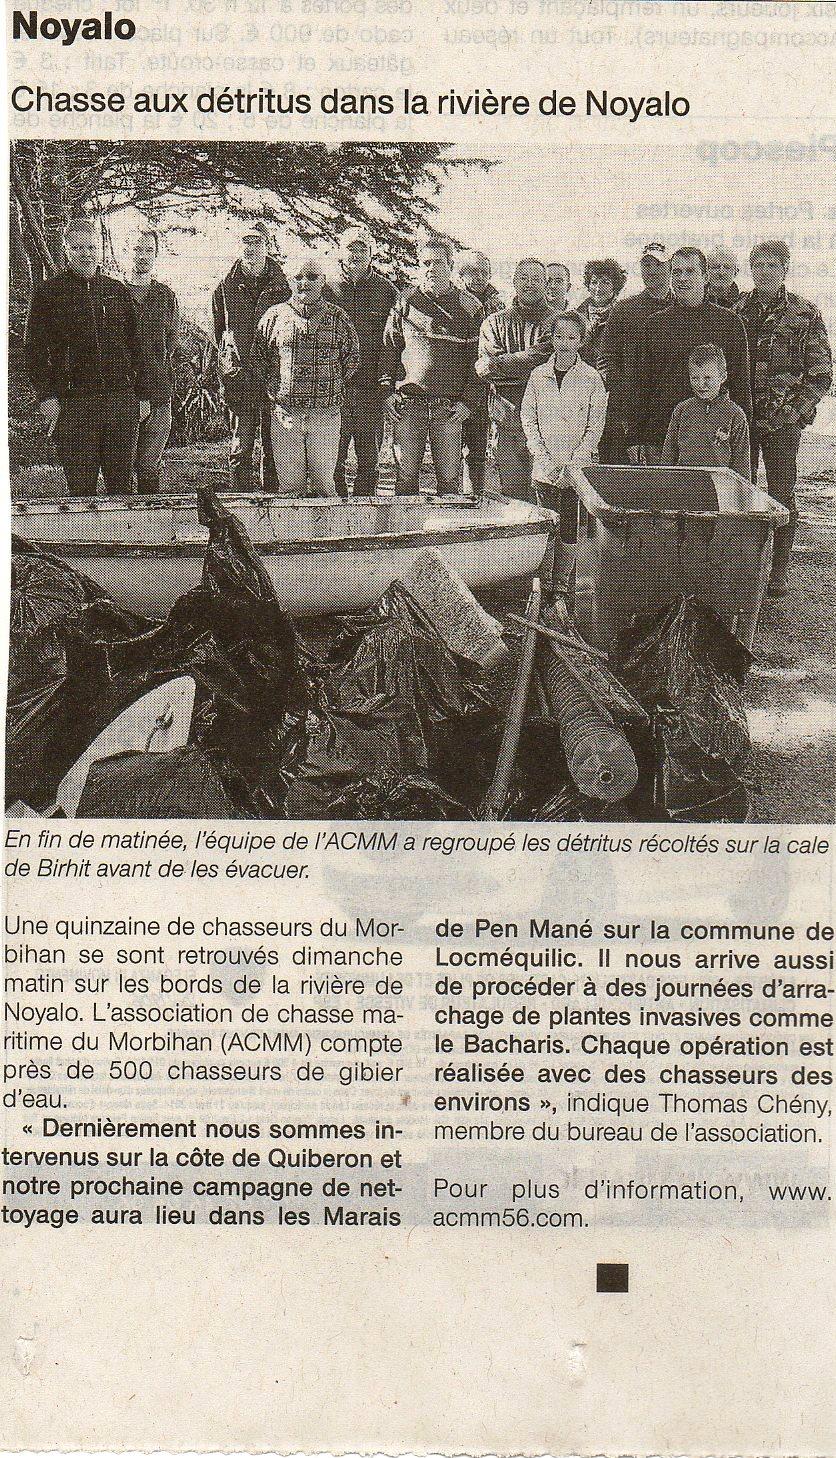 Nettoyage de noyalo201